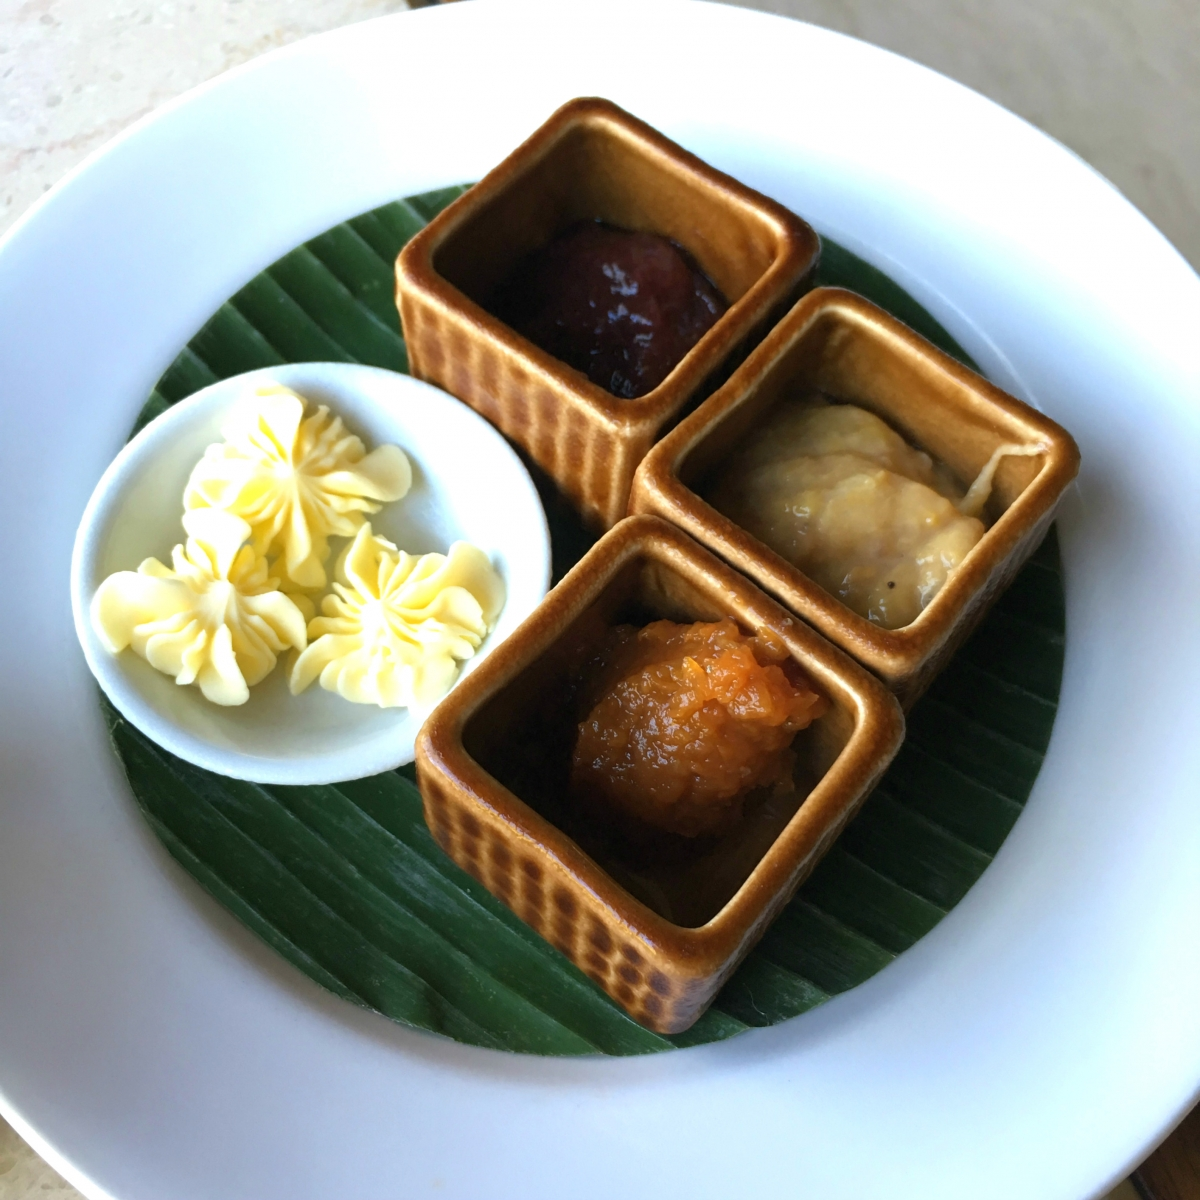 Breakfast at Komaneka